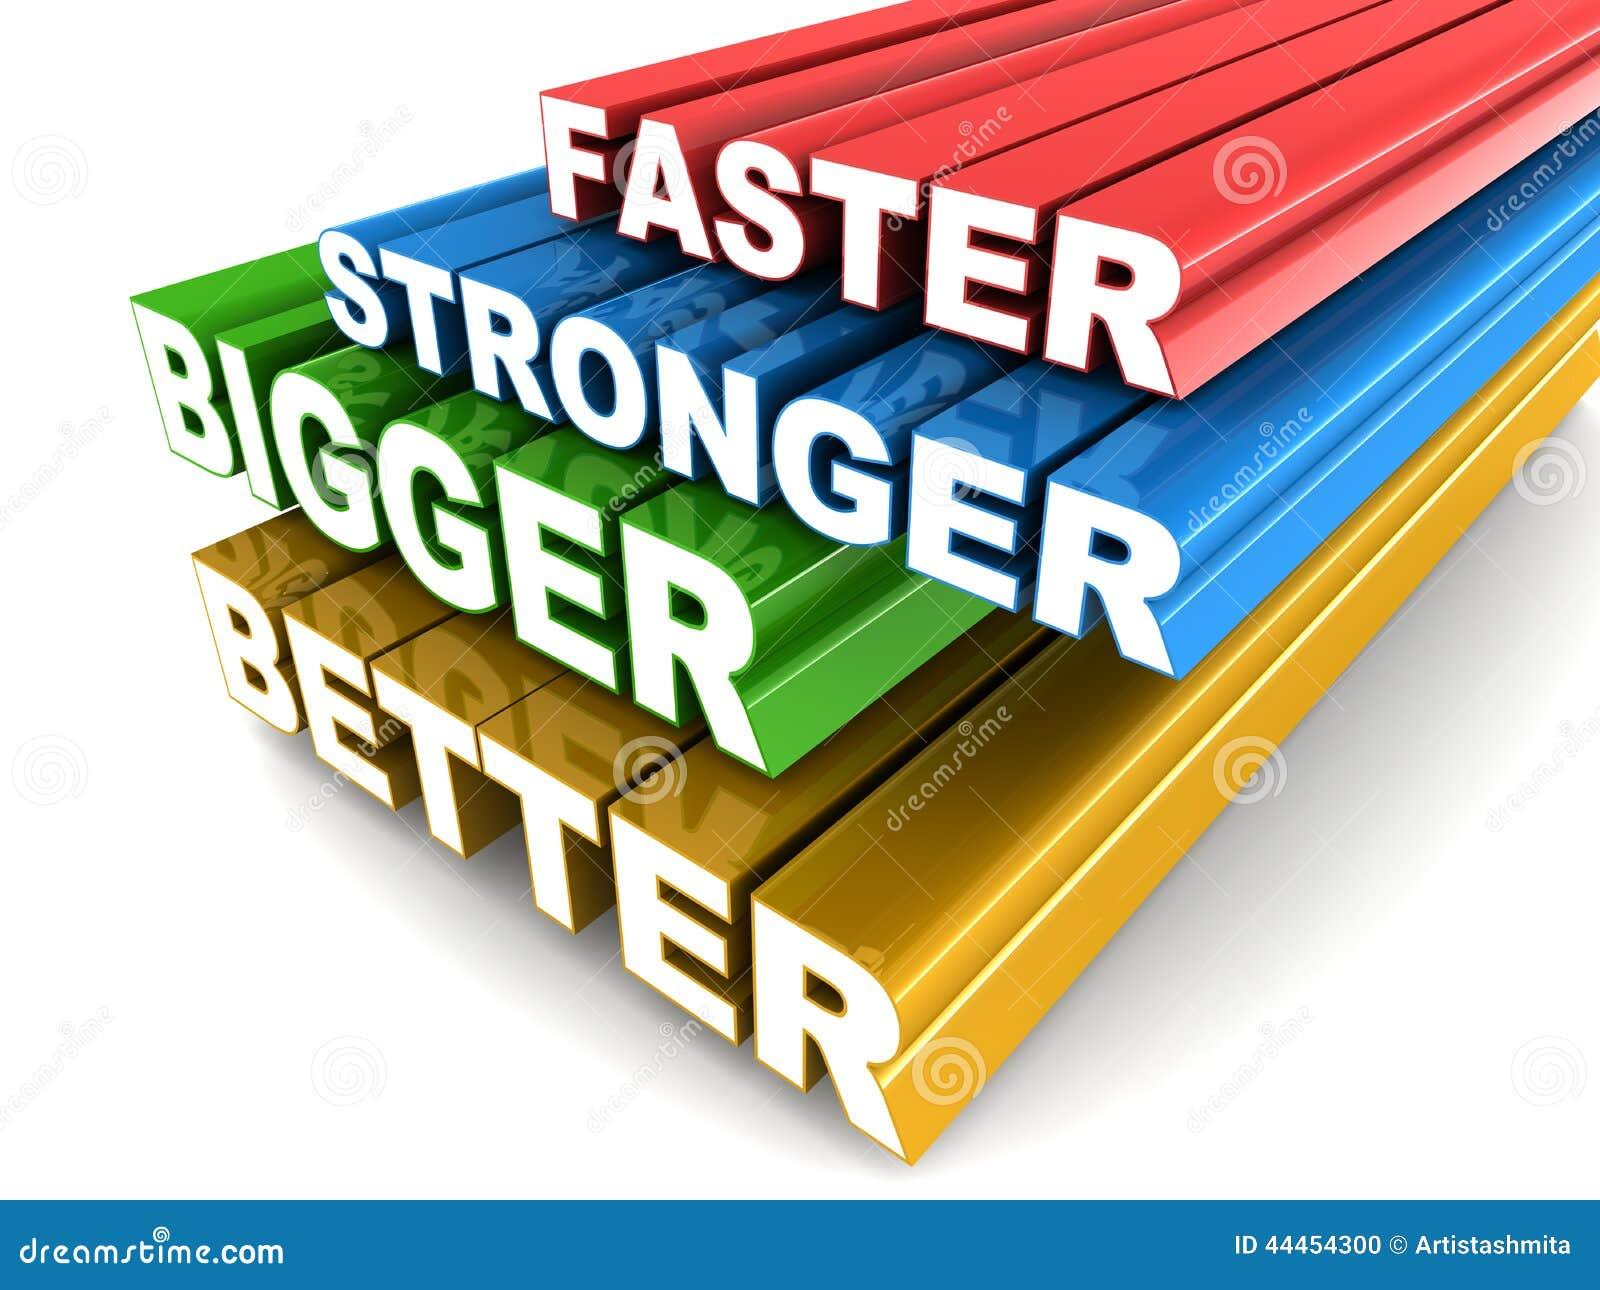 bigger stronger faster buy steroids